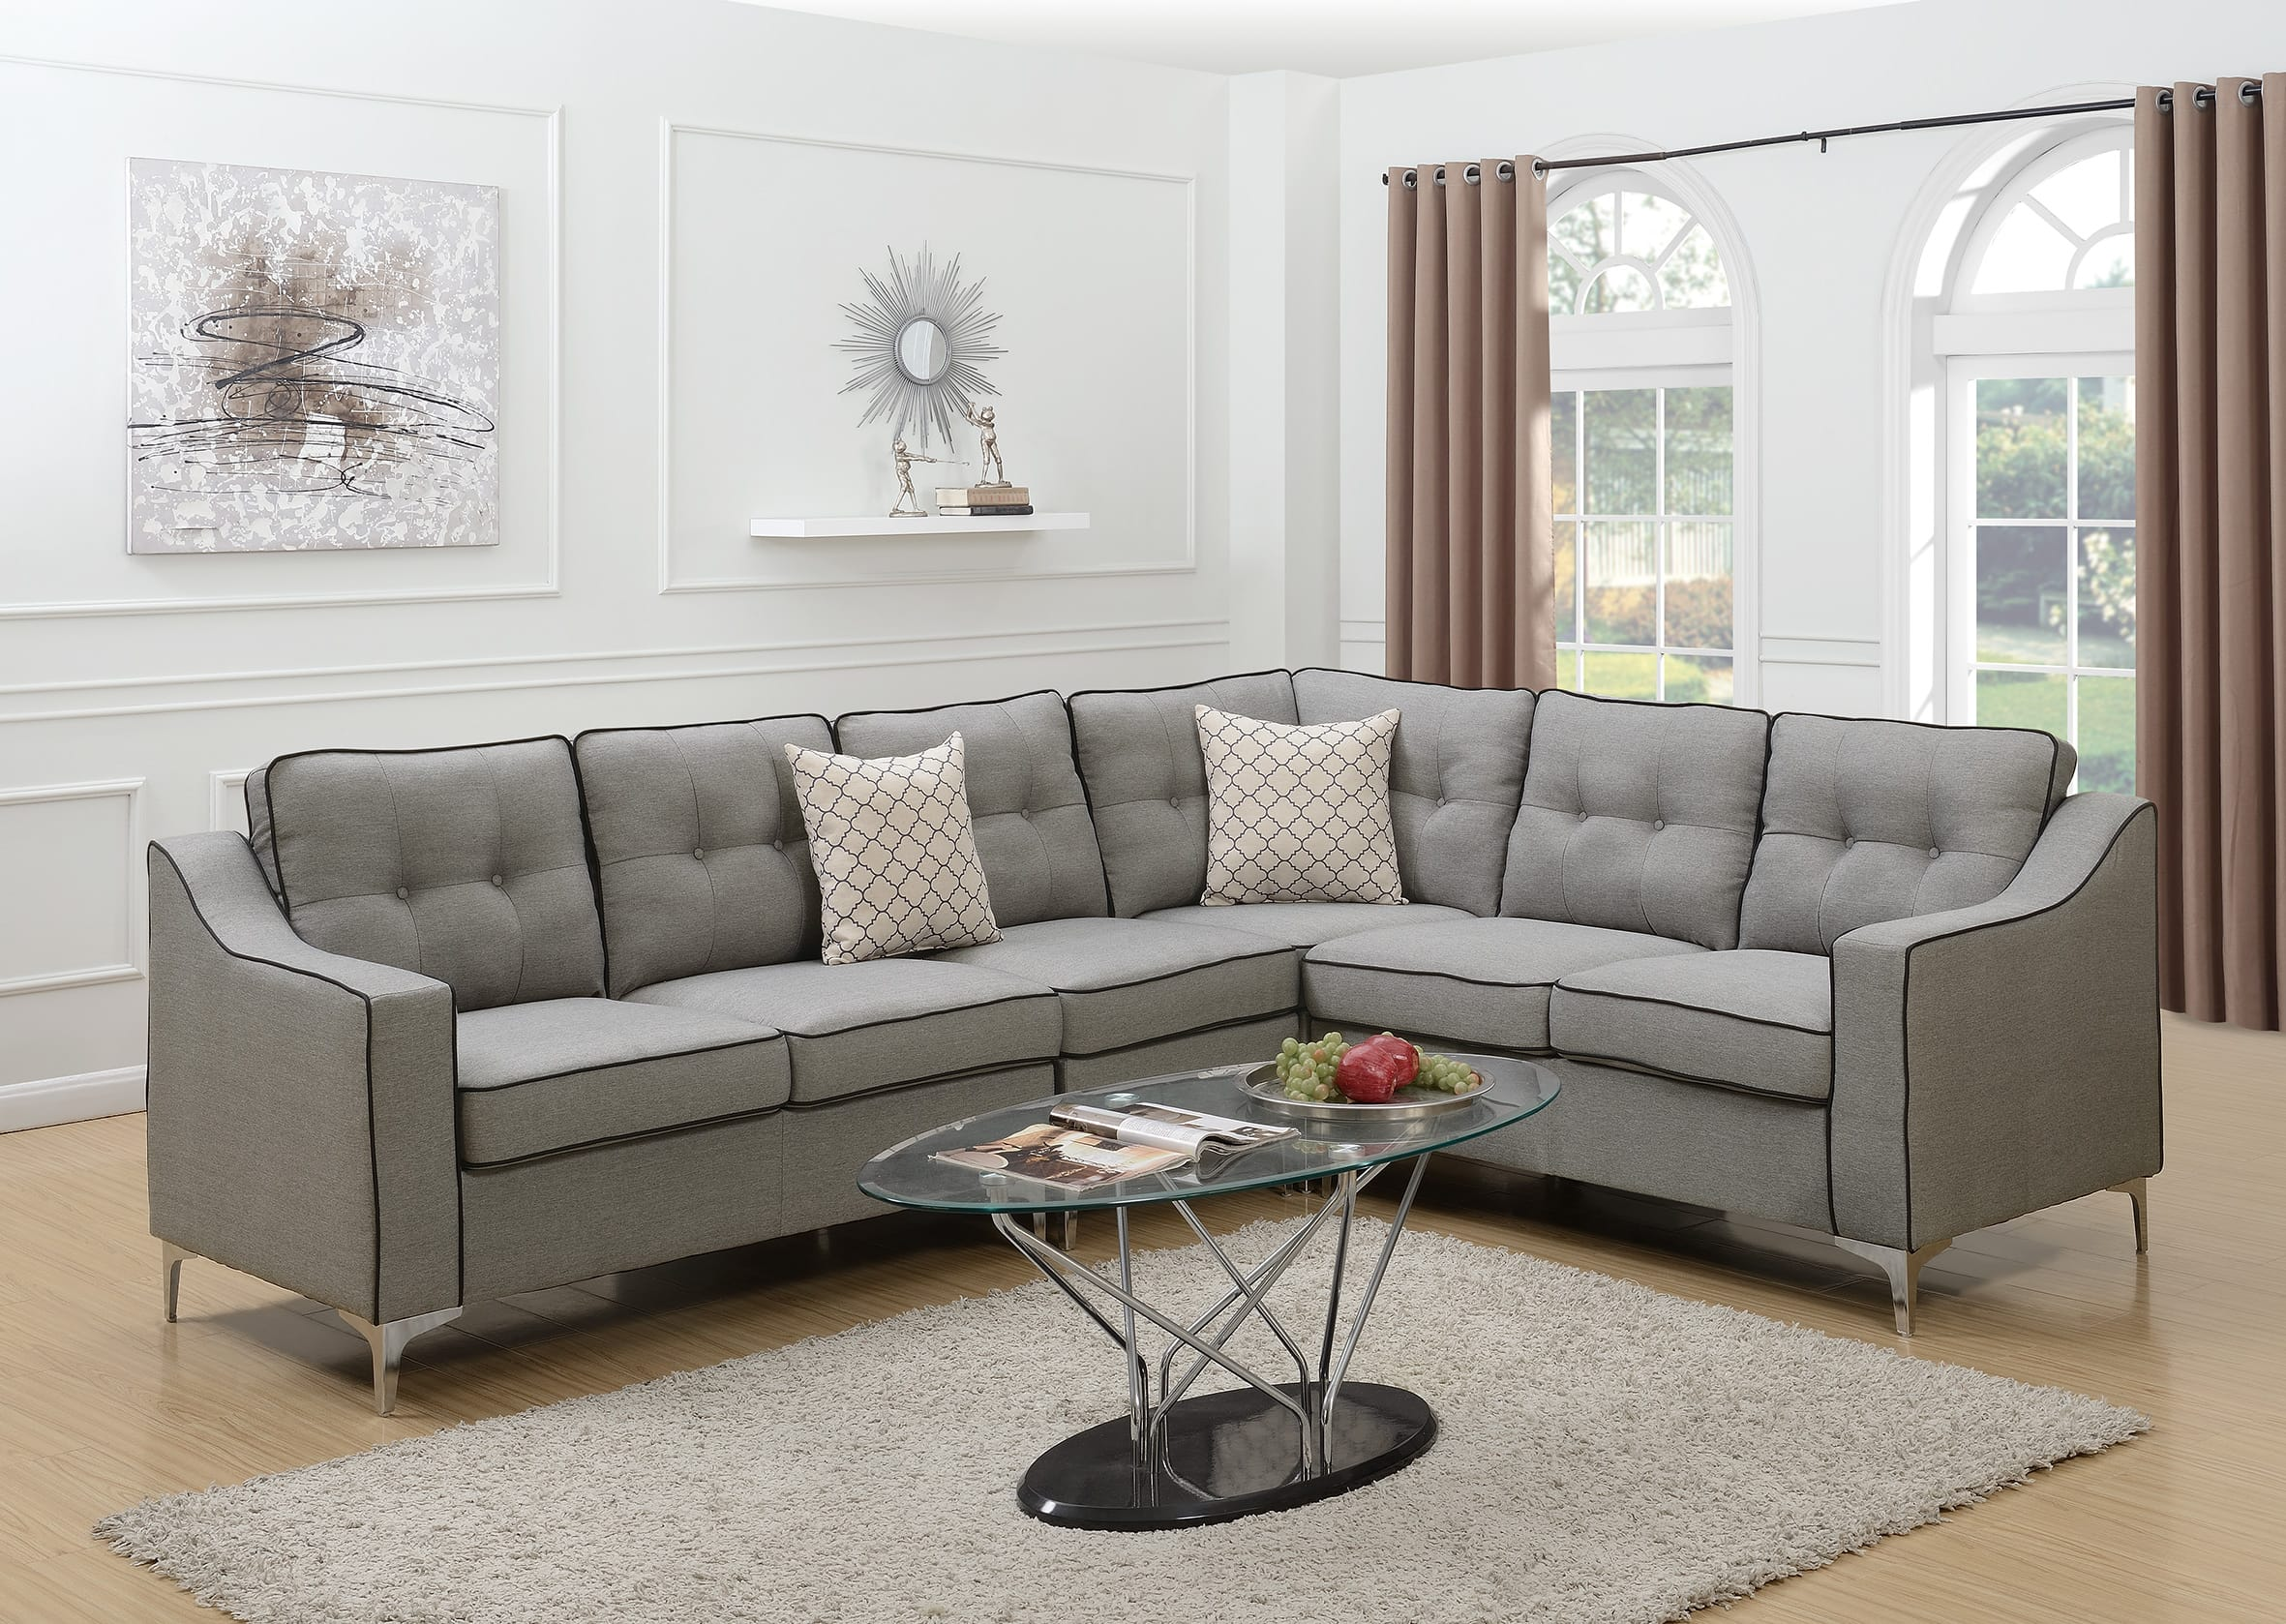 Astounding F6888 Light Gray 4 Pcs Sectional Sofa Set By Poundex Creativecarmelina Interior Chair Design Creativecarmelinacom